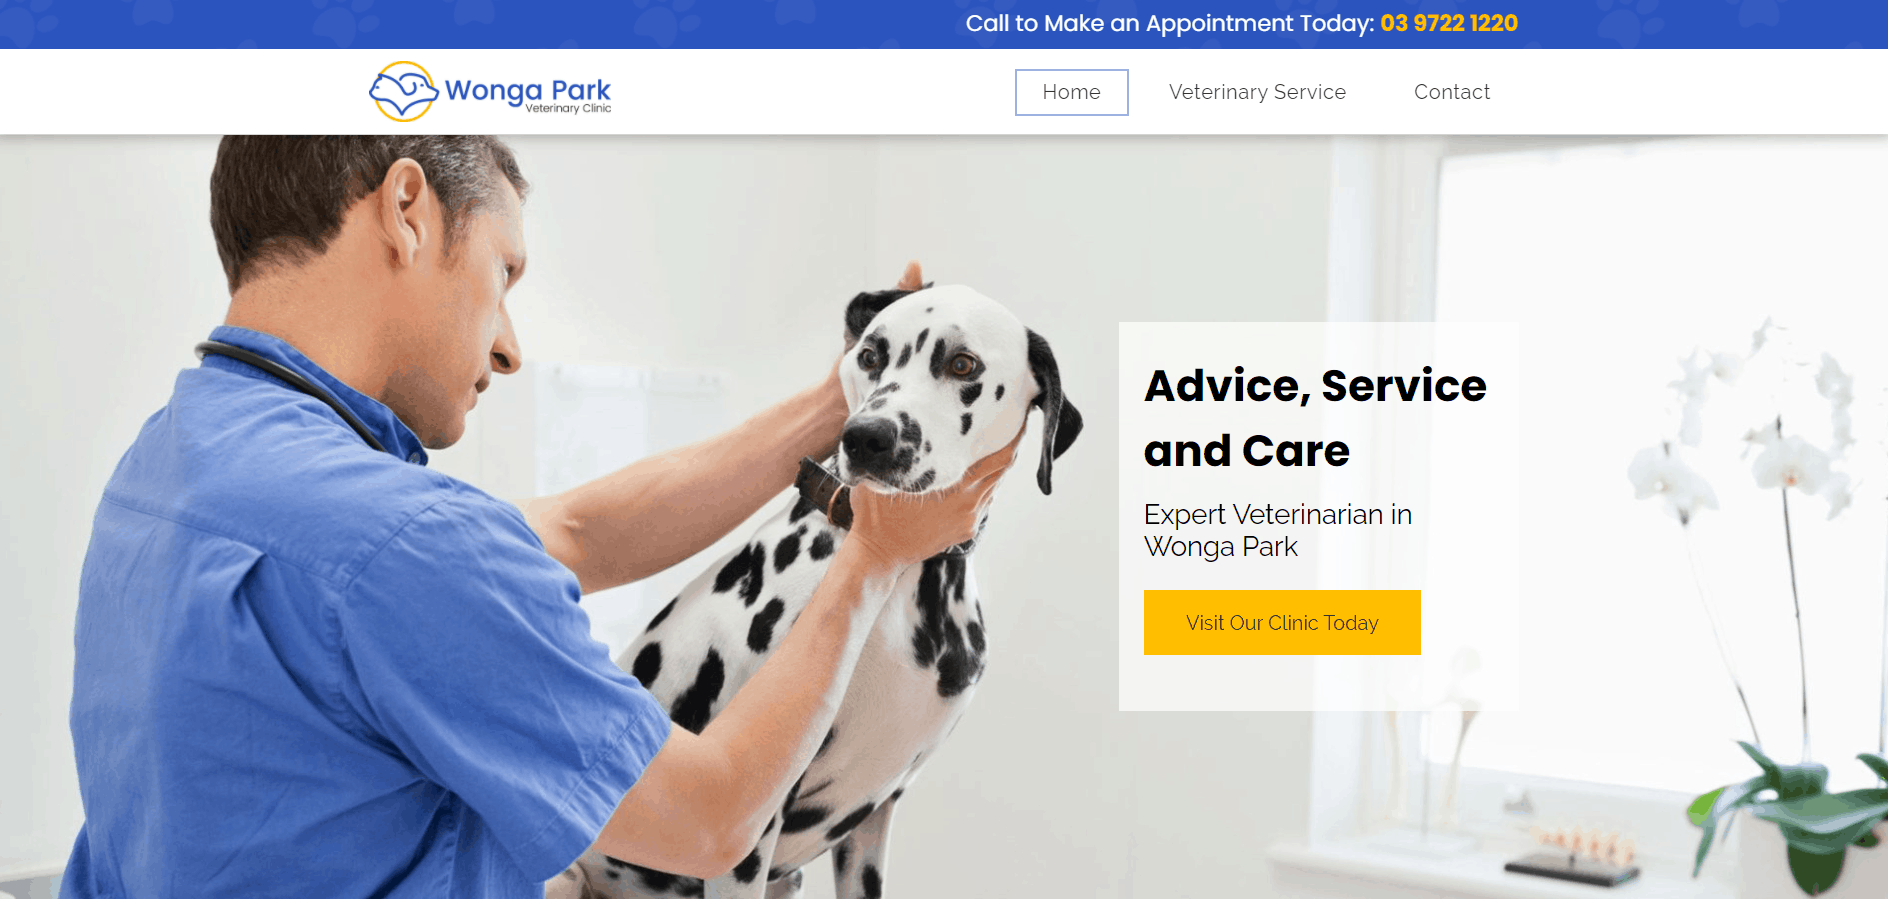 Wonga Park Veterinary Clinic